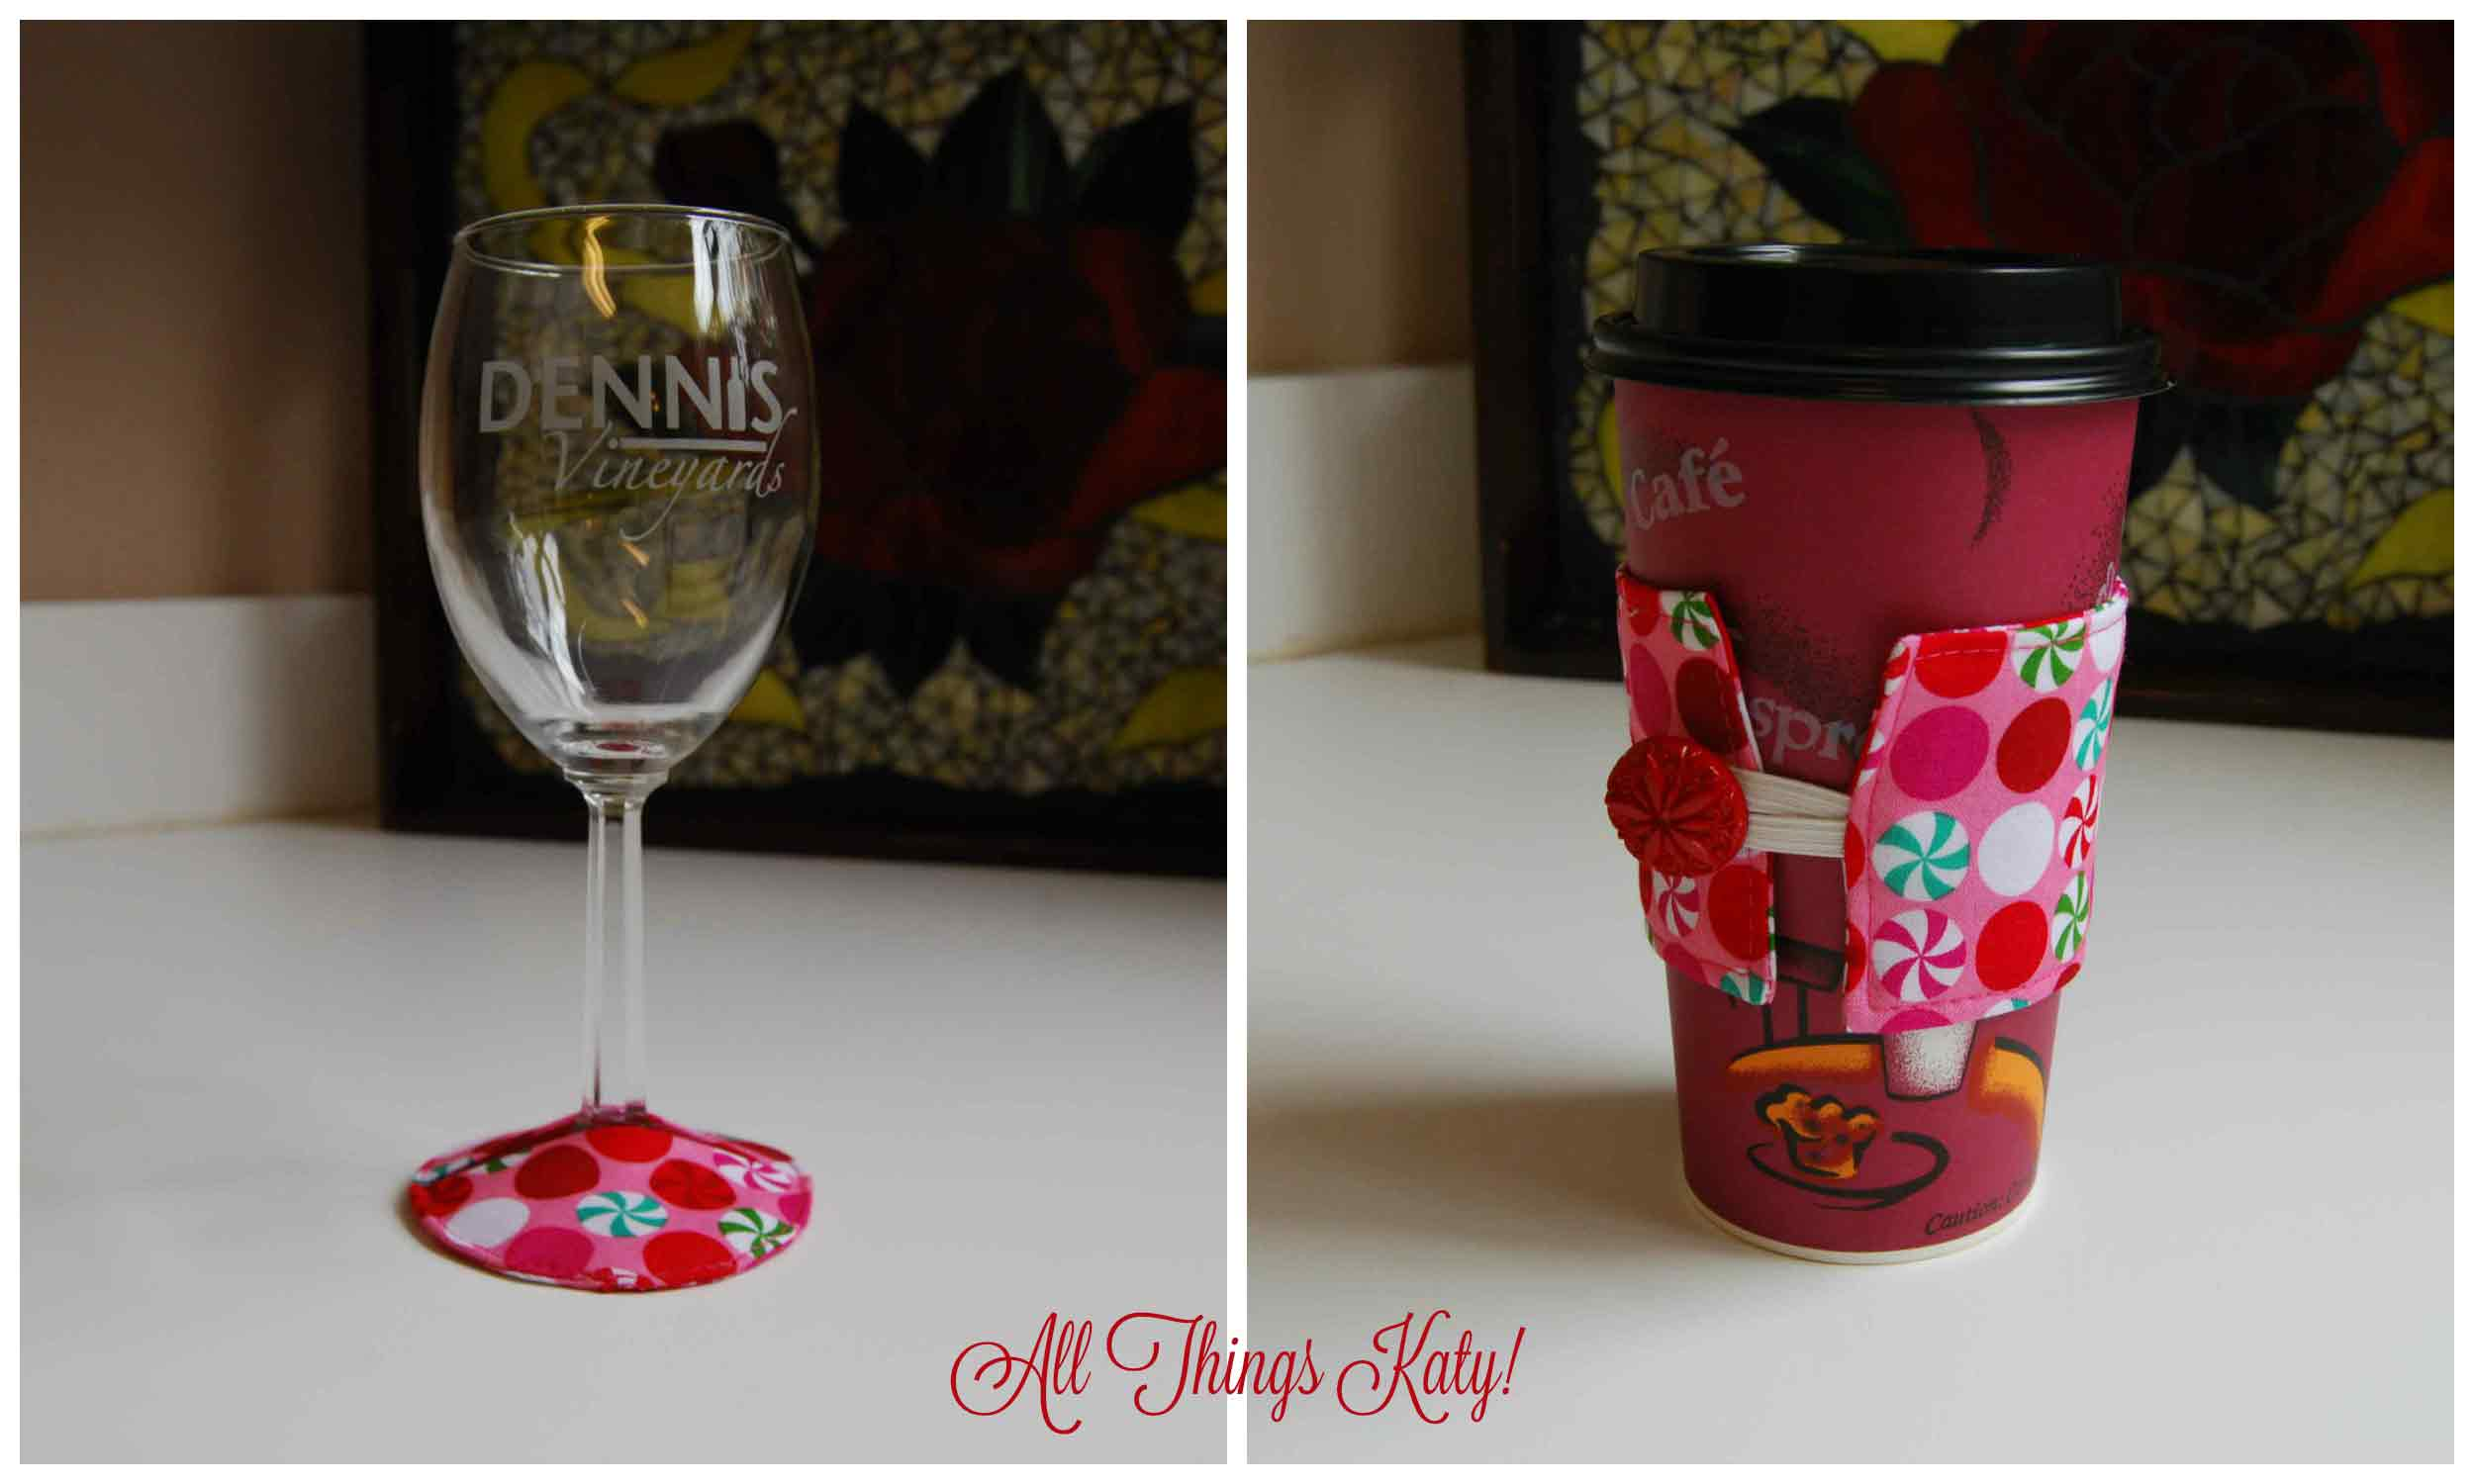 cup_glass2_wm.jpg